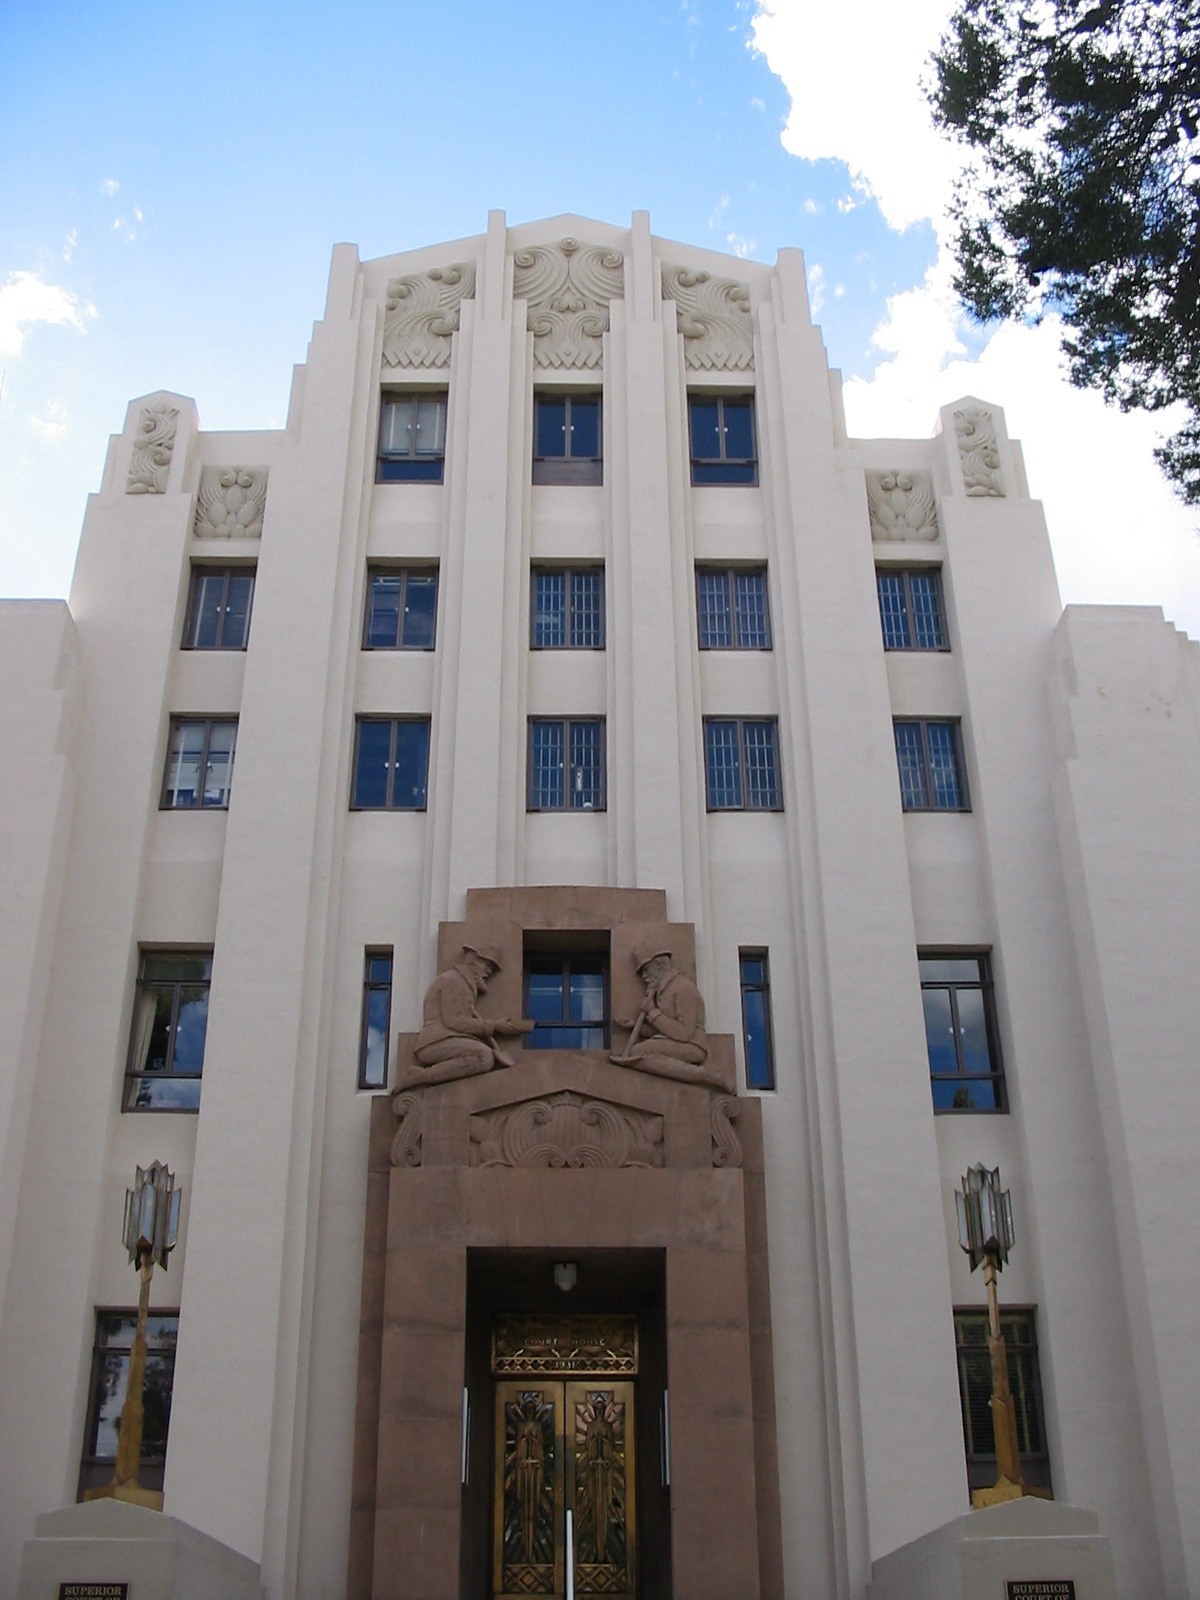 Sierra County Building Codes Incinolet